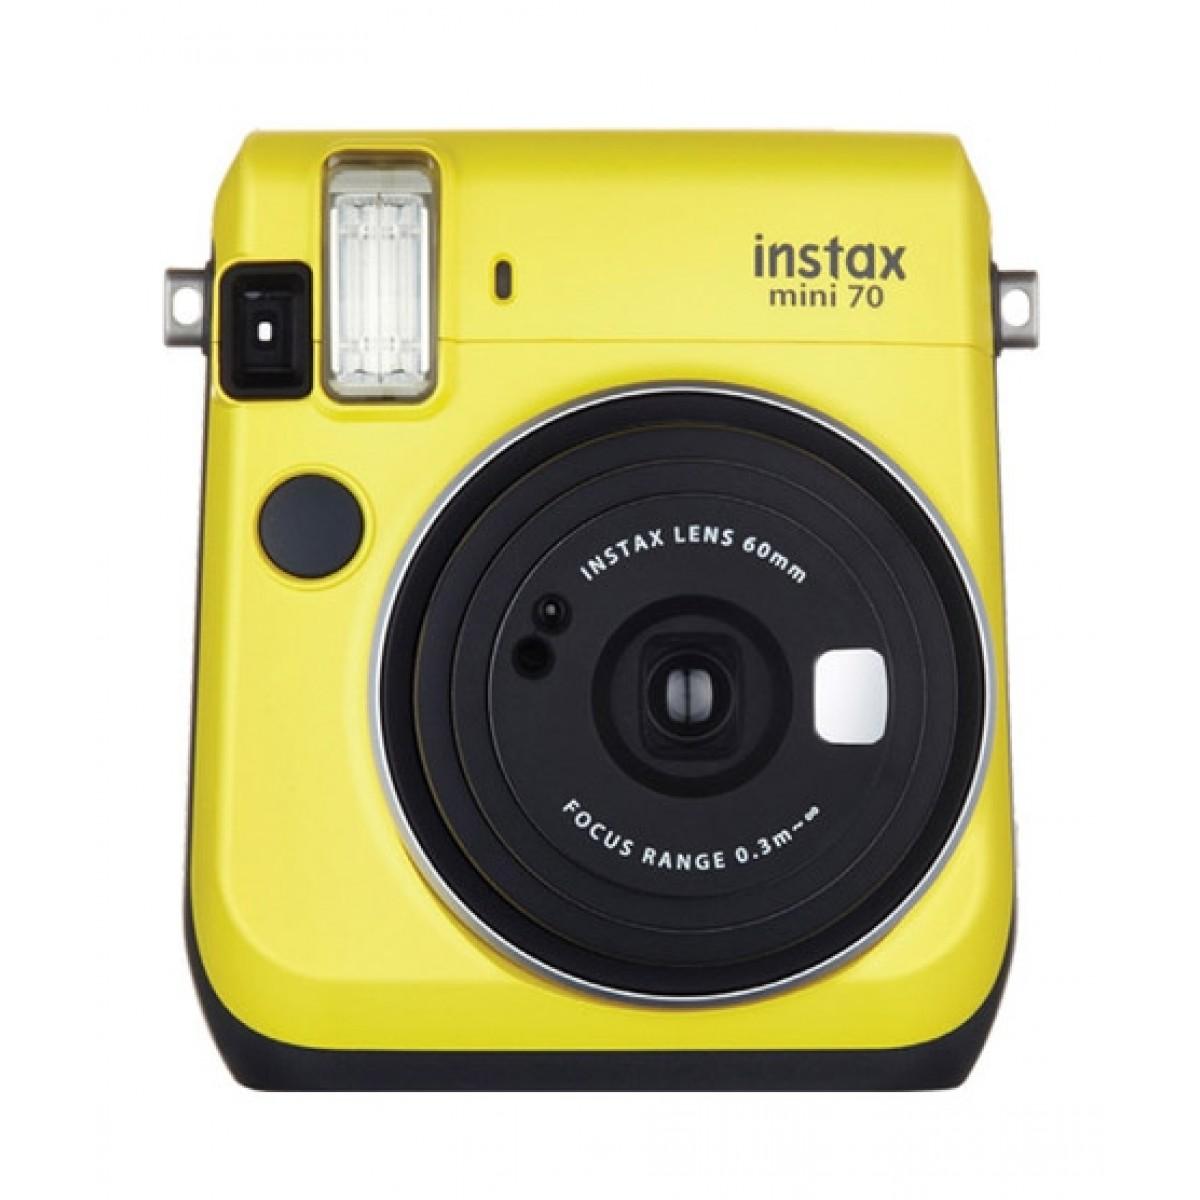 Flipkart.com | Buy Fujifilm Instax Mini 70 Instant Camera